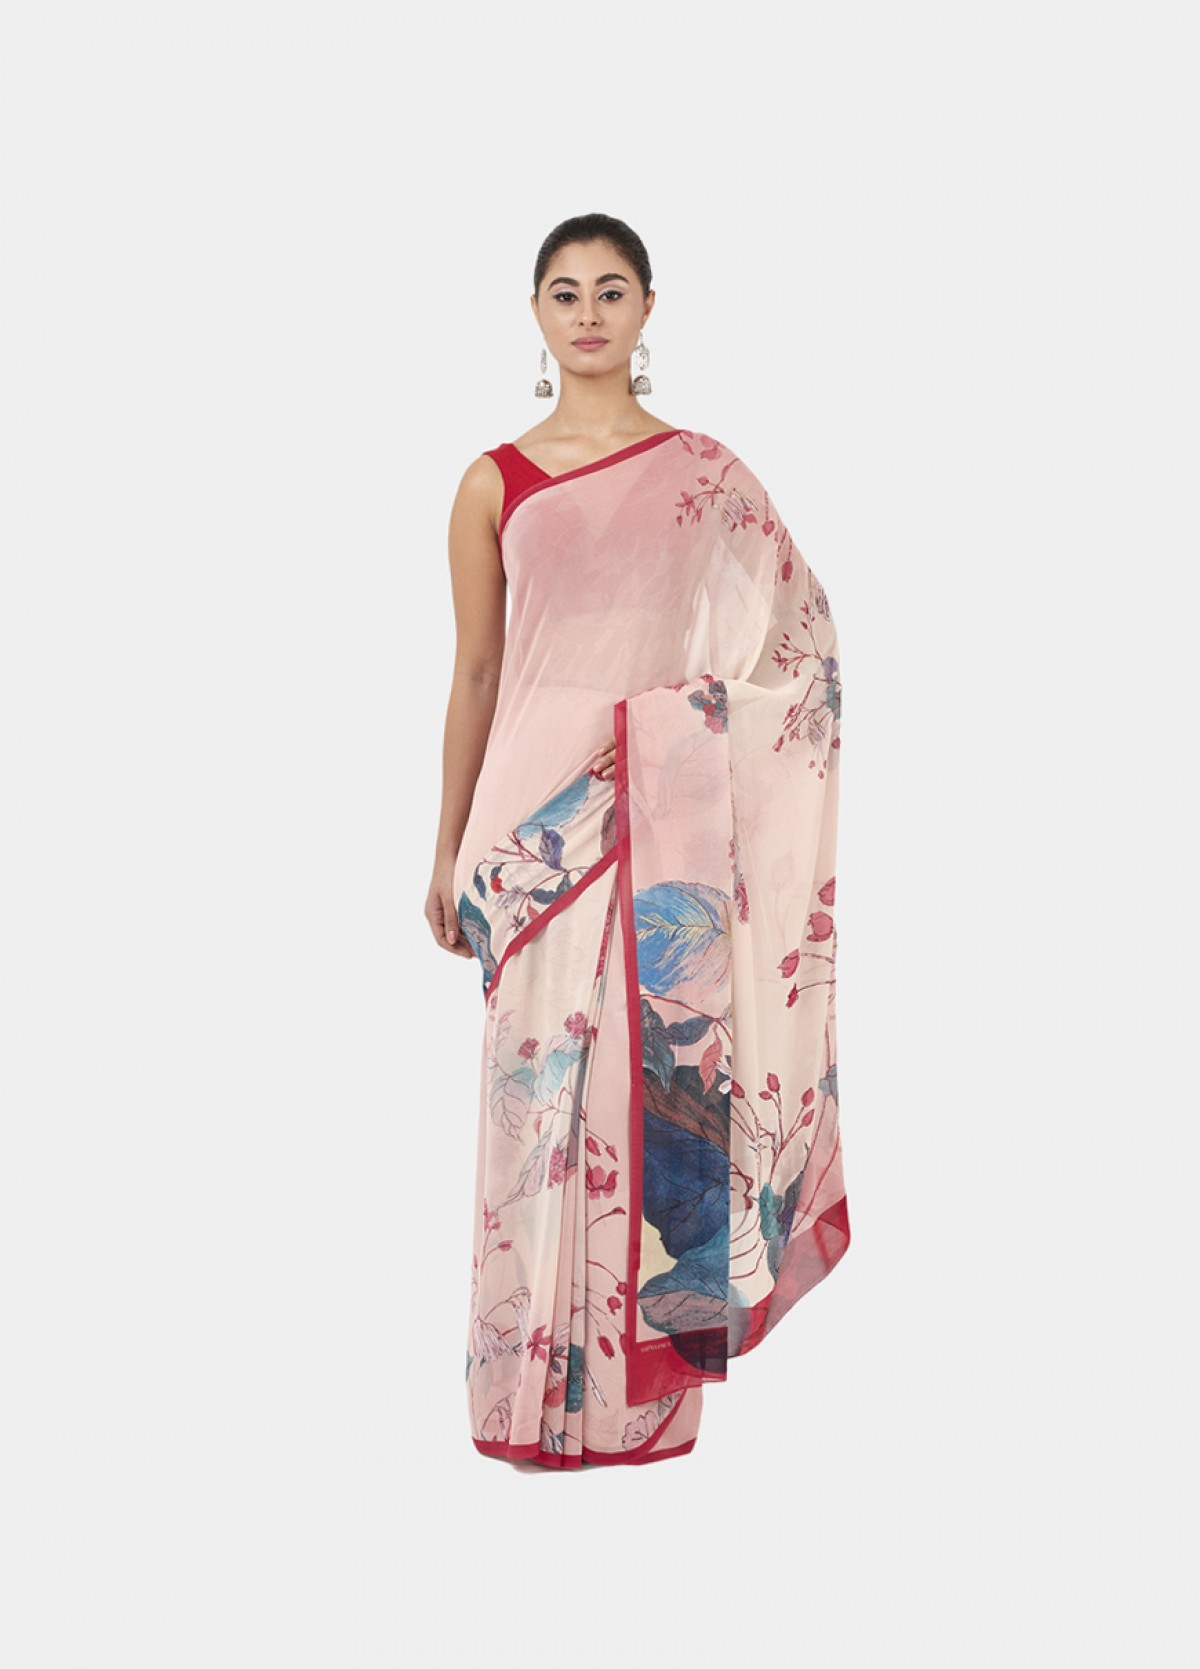 The Bagh Sari